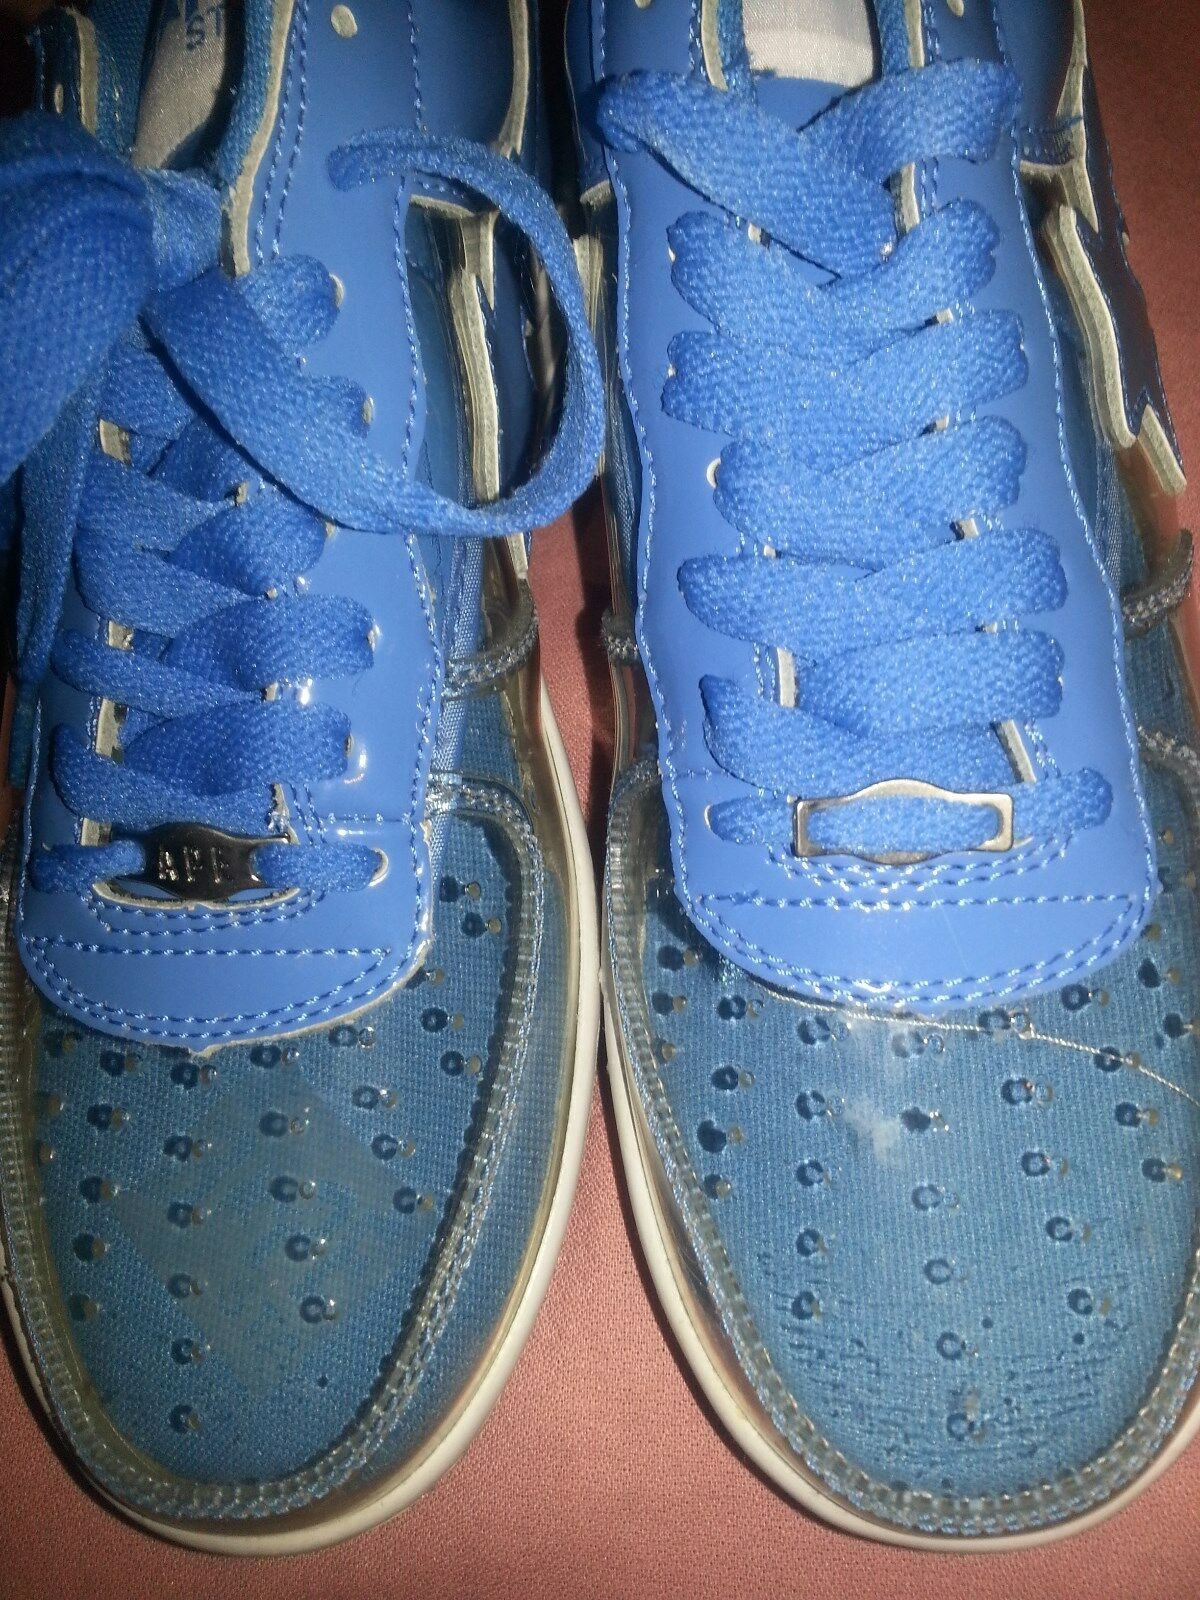 Bathing Ape Uomo shoe size 6.5 Sky Blue and Clear